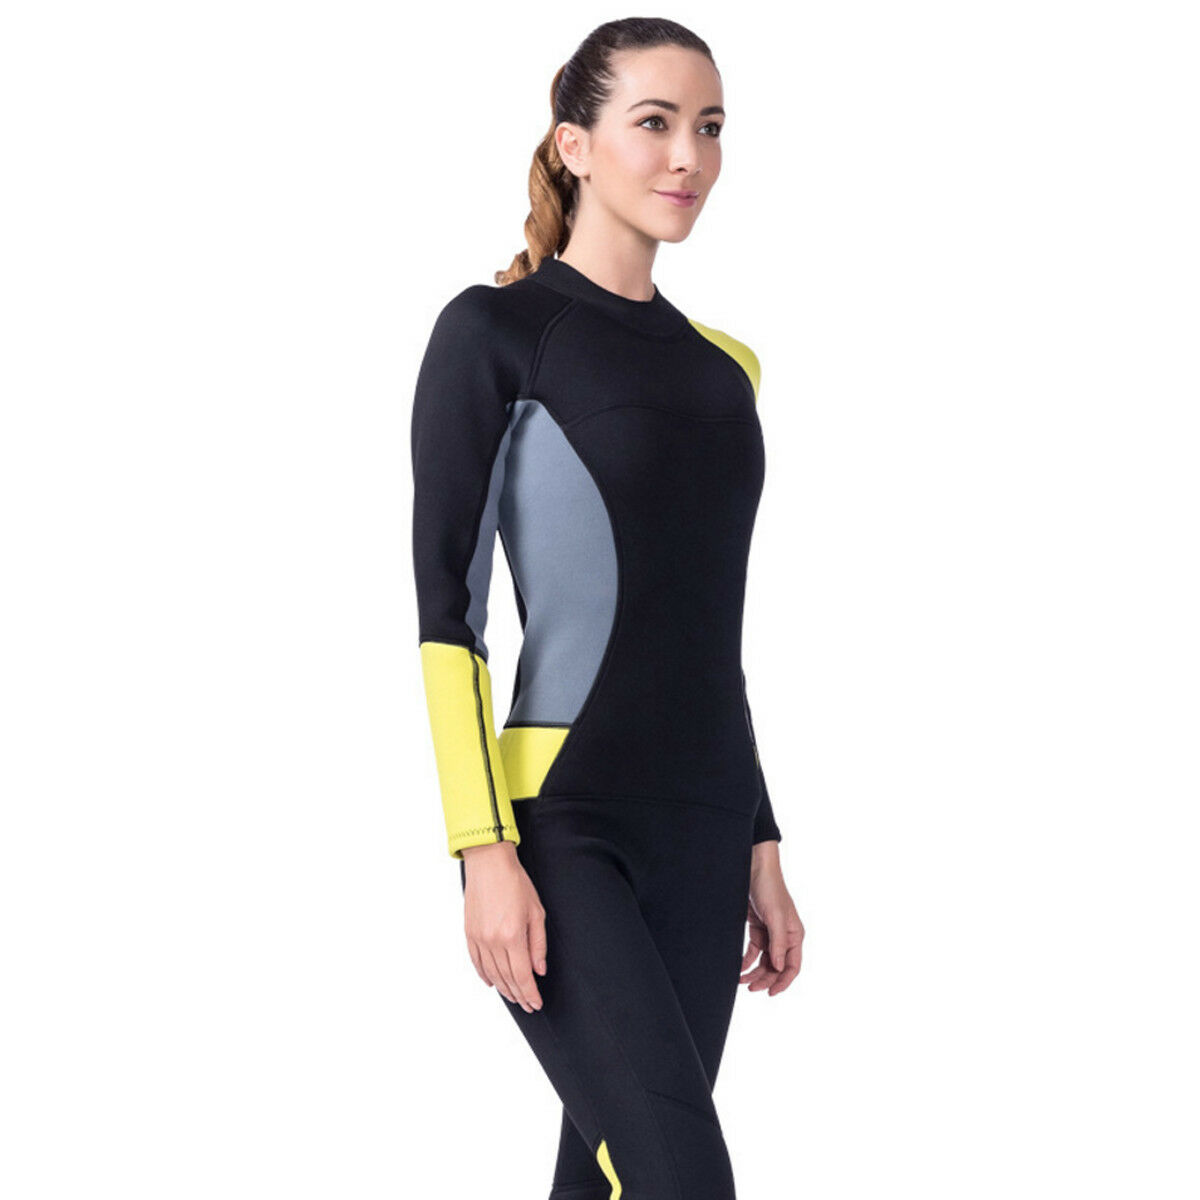 3mm Women Long Sleeve Wetsuit Surfing Scuba Diving Neoprene One-Piece Swim Suit